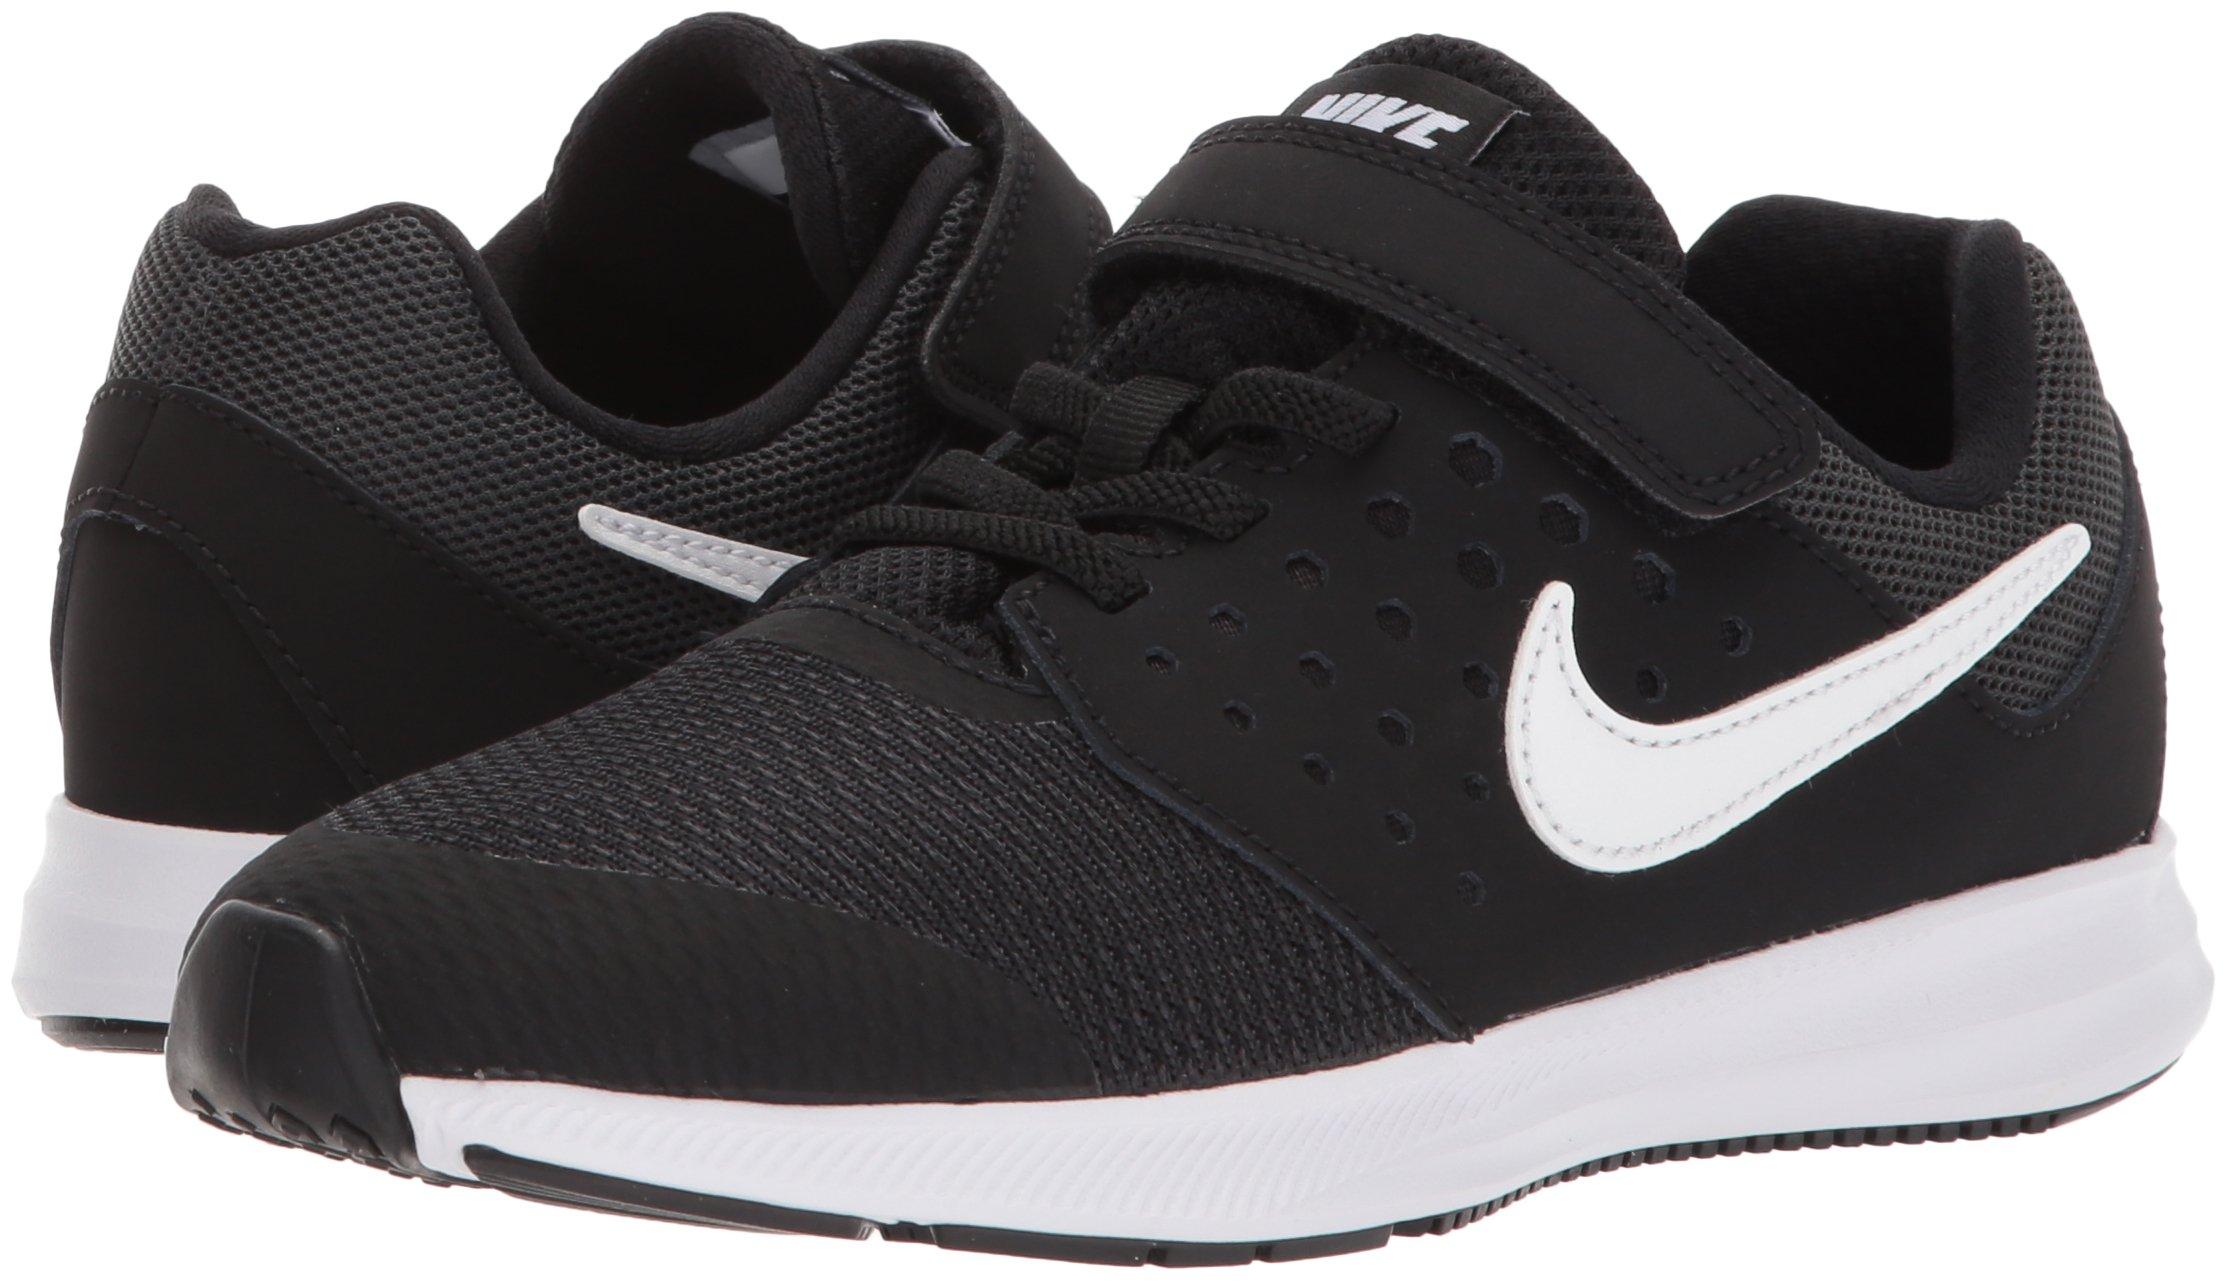 Nike Boys' Downshifter 7 (PSV) Running Shoe, Black/White-Anthracite, 3 M US Little Kid by Nike (Image #5)